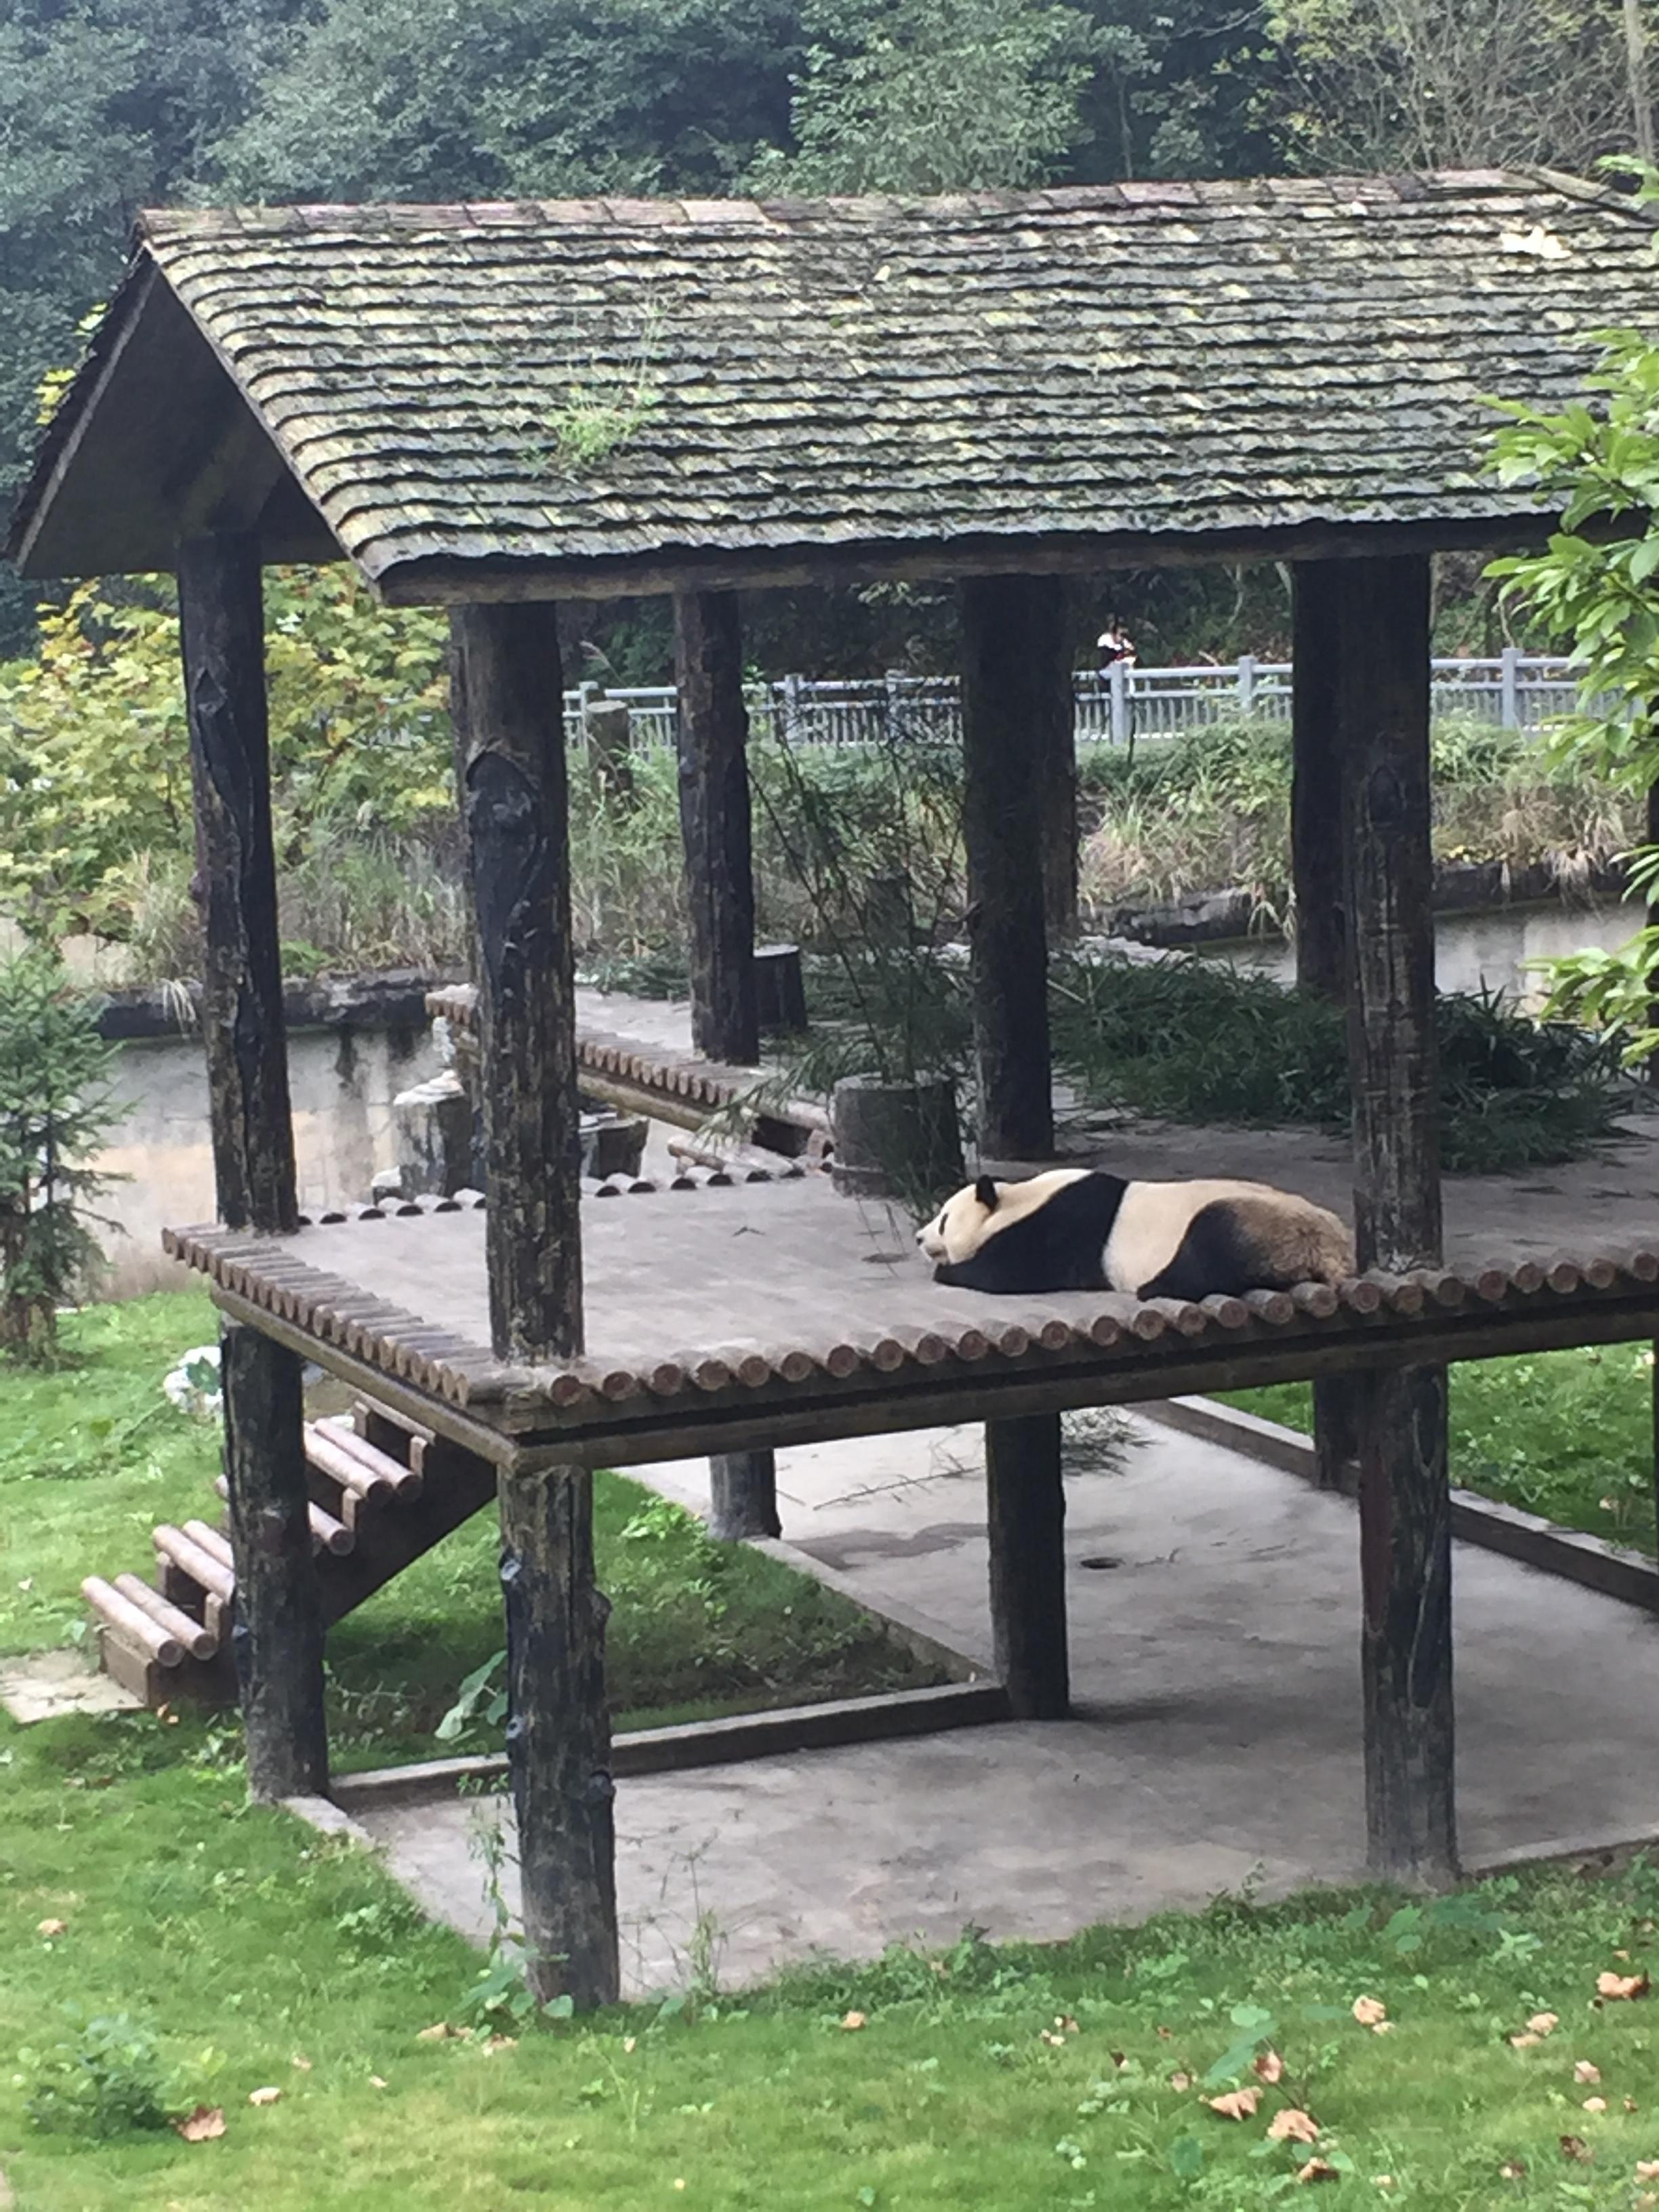 Panda sleeping in his hut